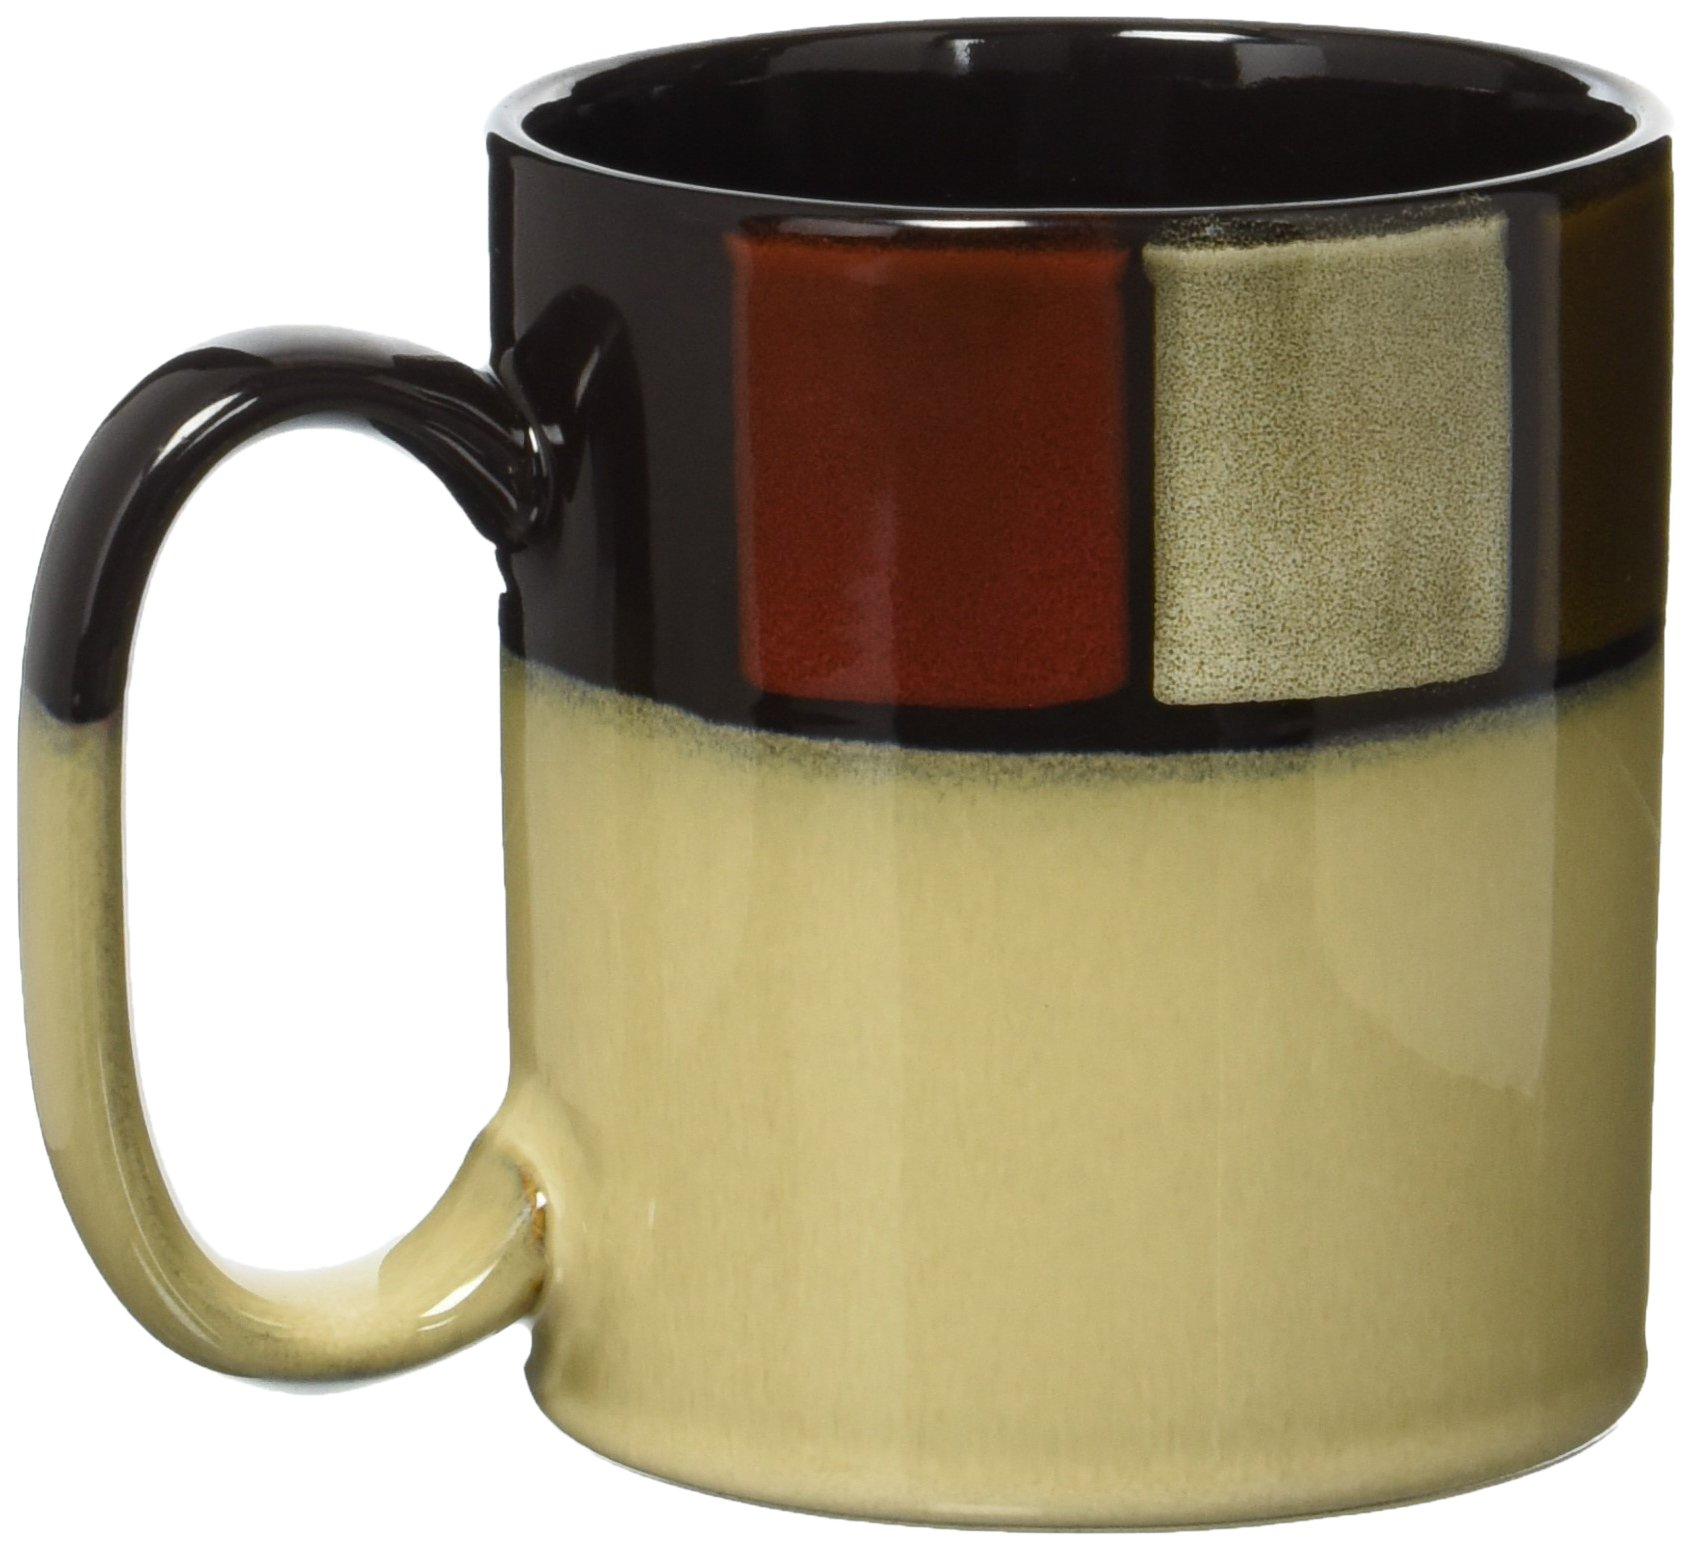 Pfaltzgraff Everyday Taos Oversized Mug, 28-Ounce